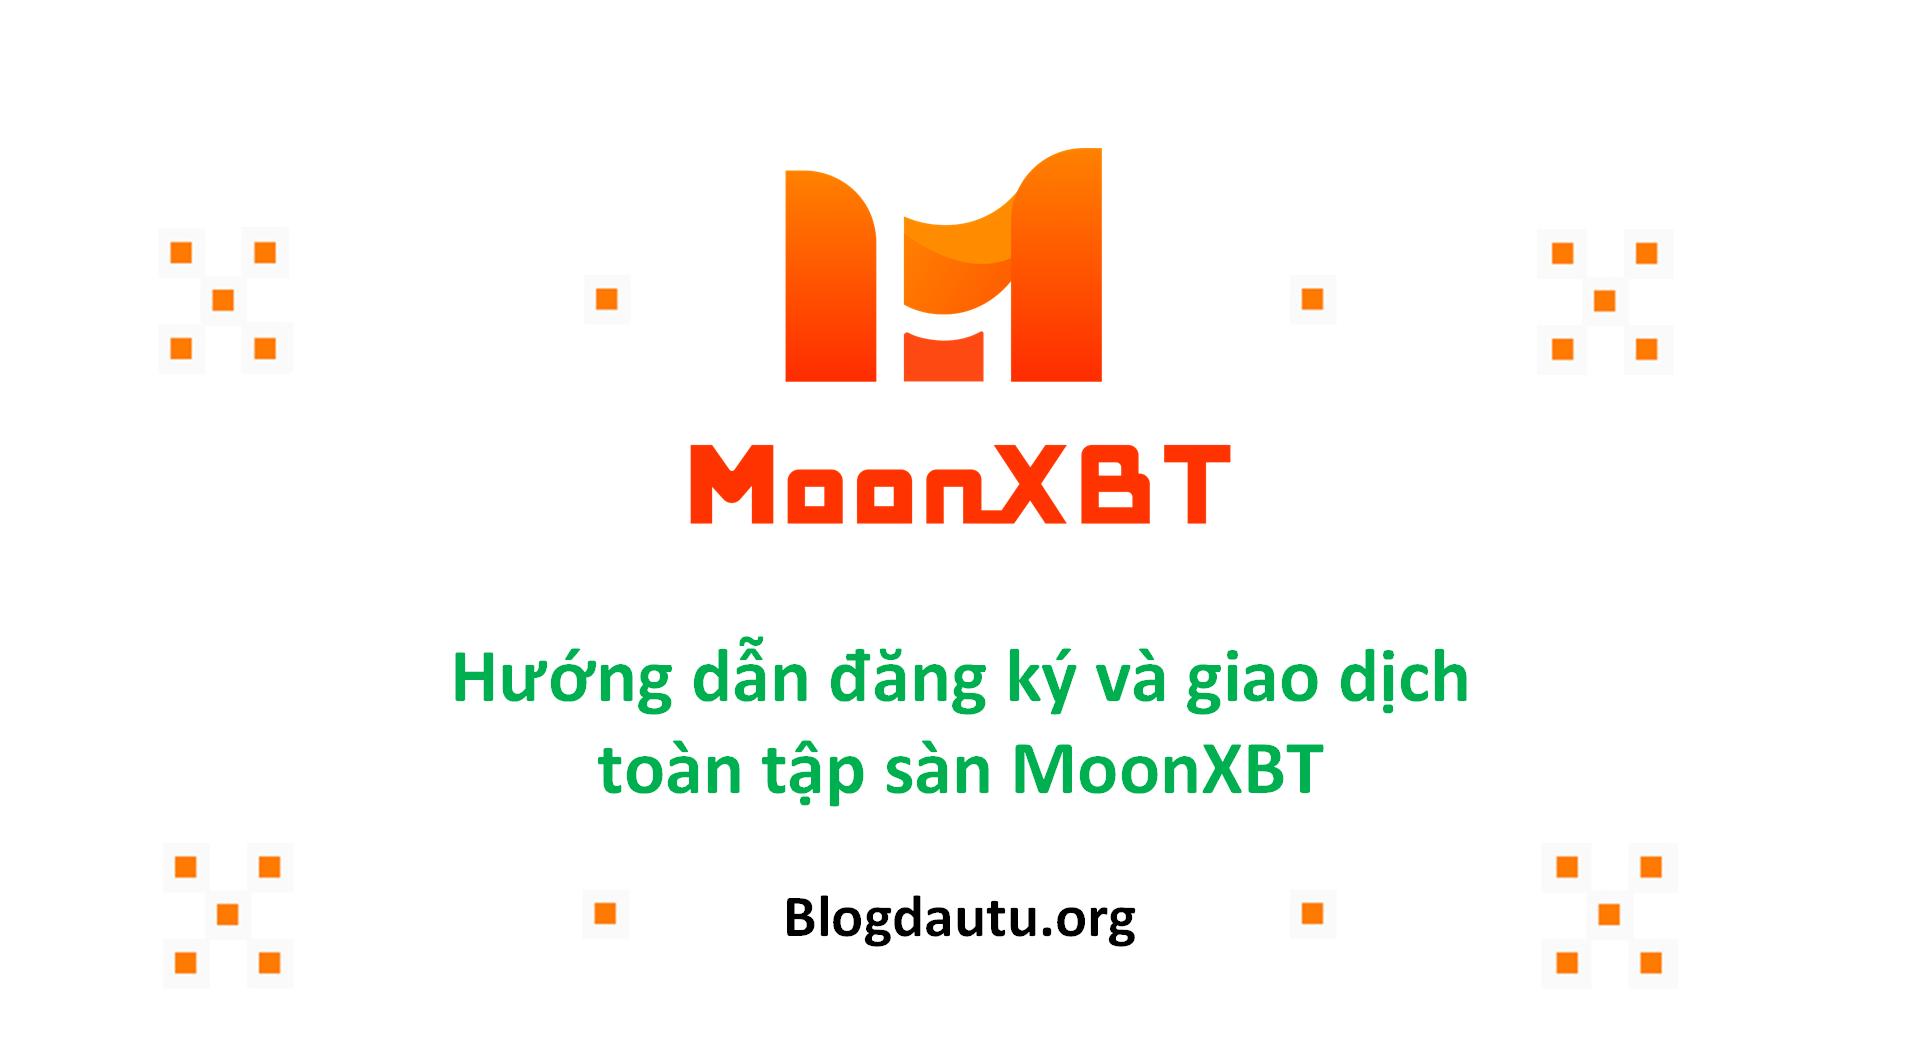 San-MoonXBT-Huong-Dan-Dang-Ky-va-Giao-Dich-Toan-Tap